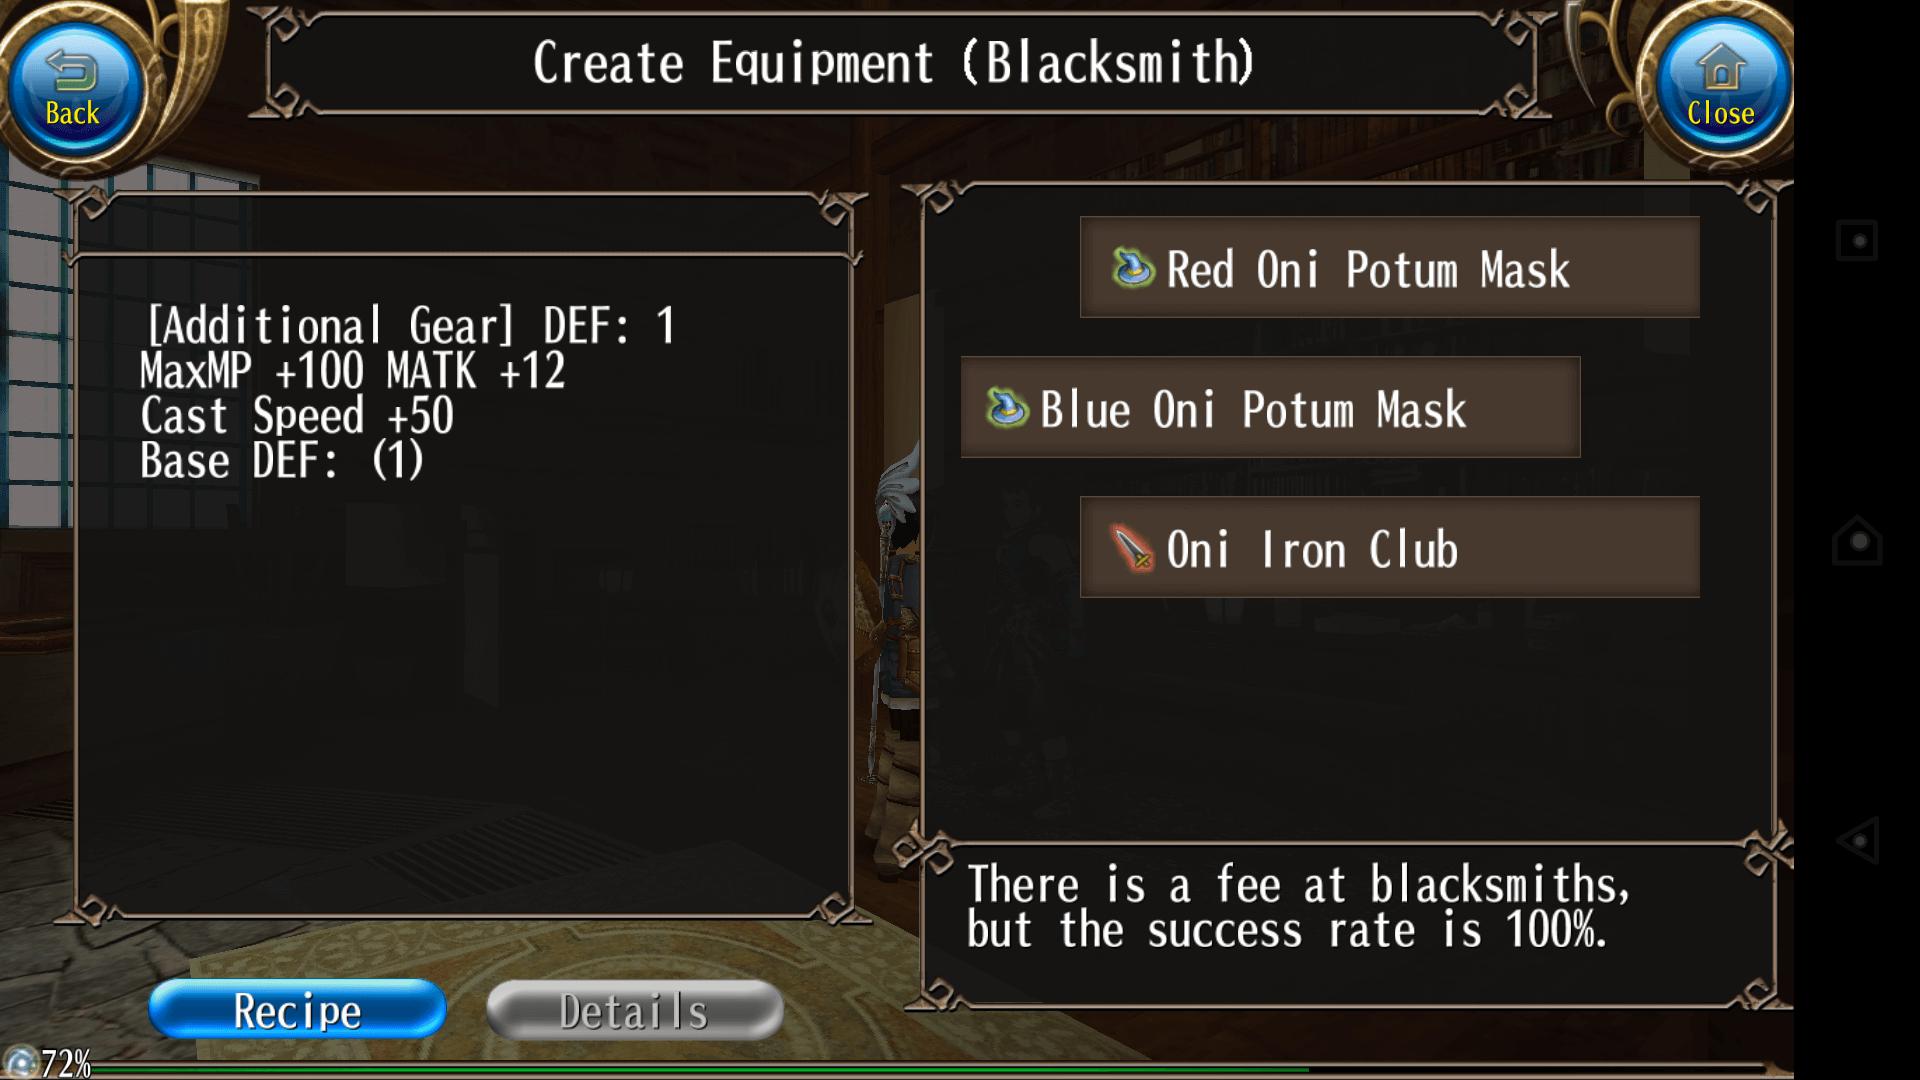 Blue oni potum mask